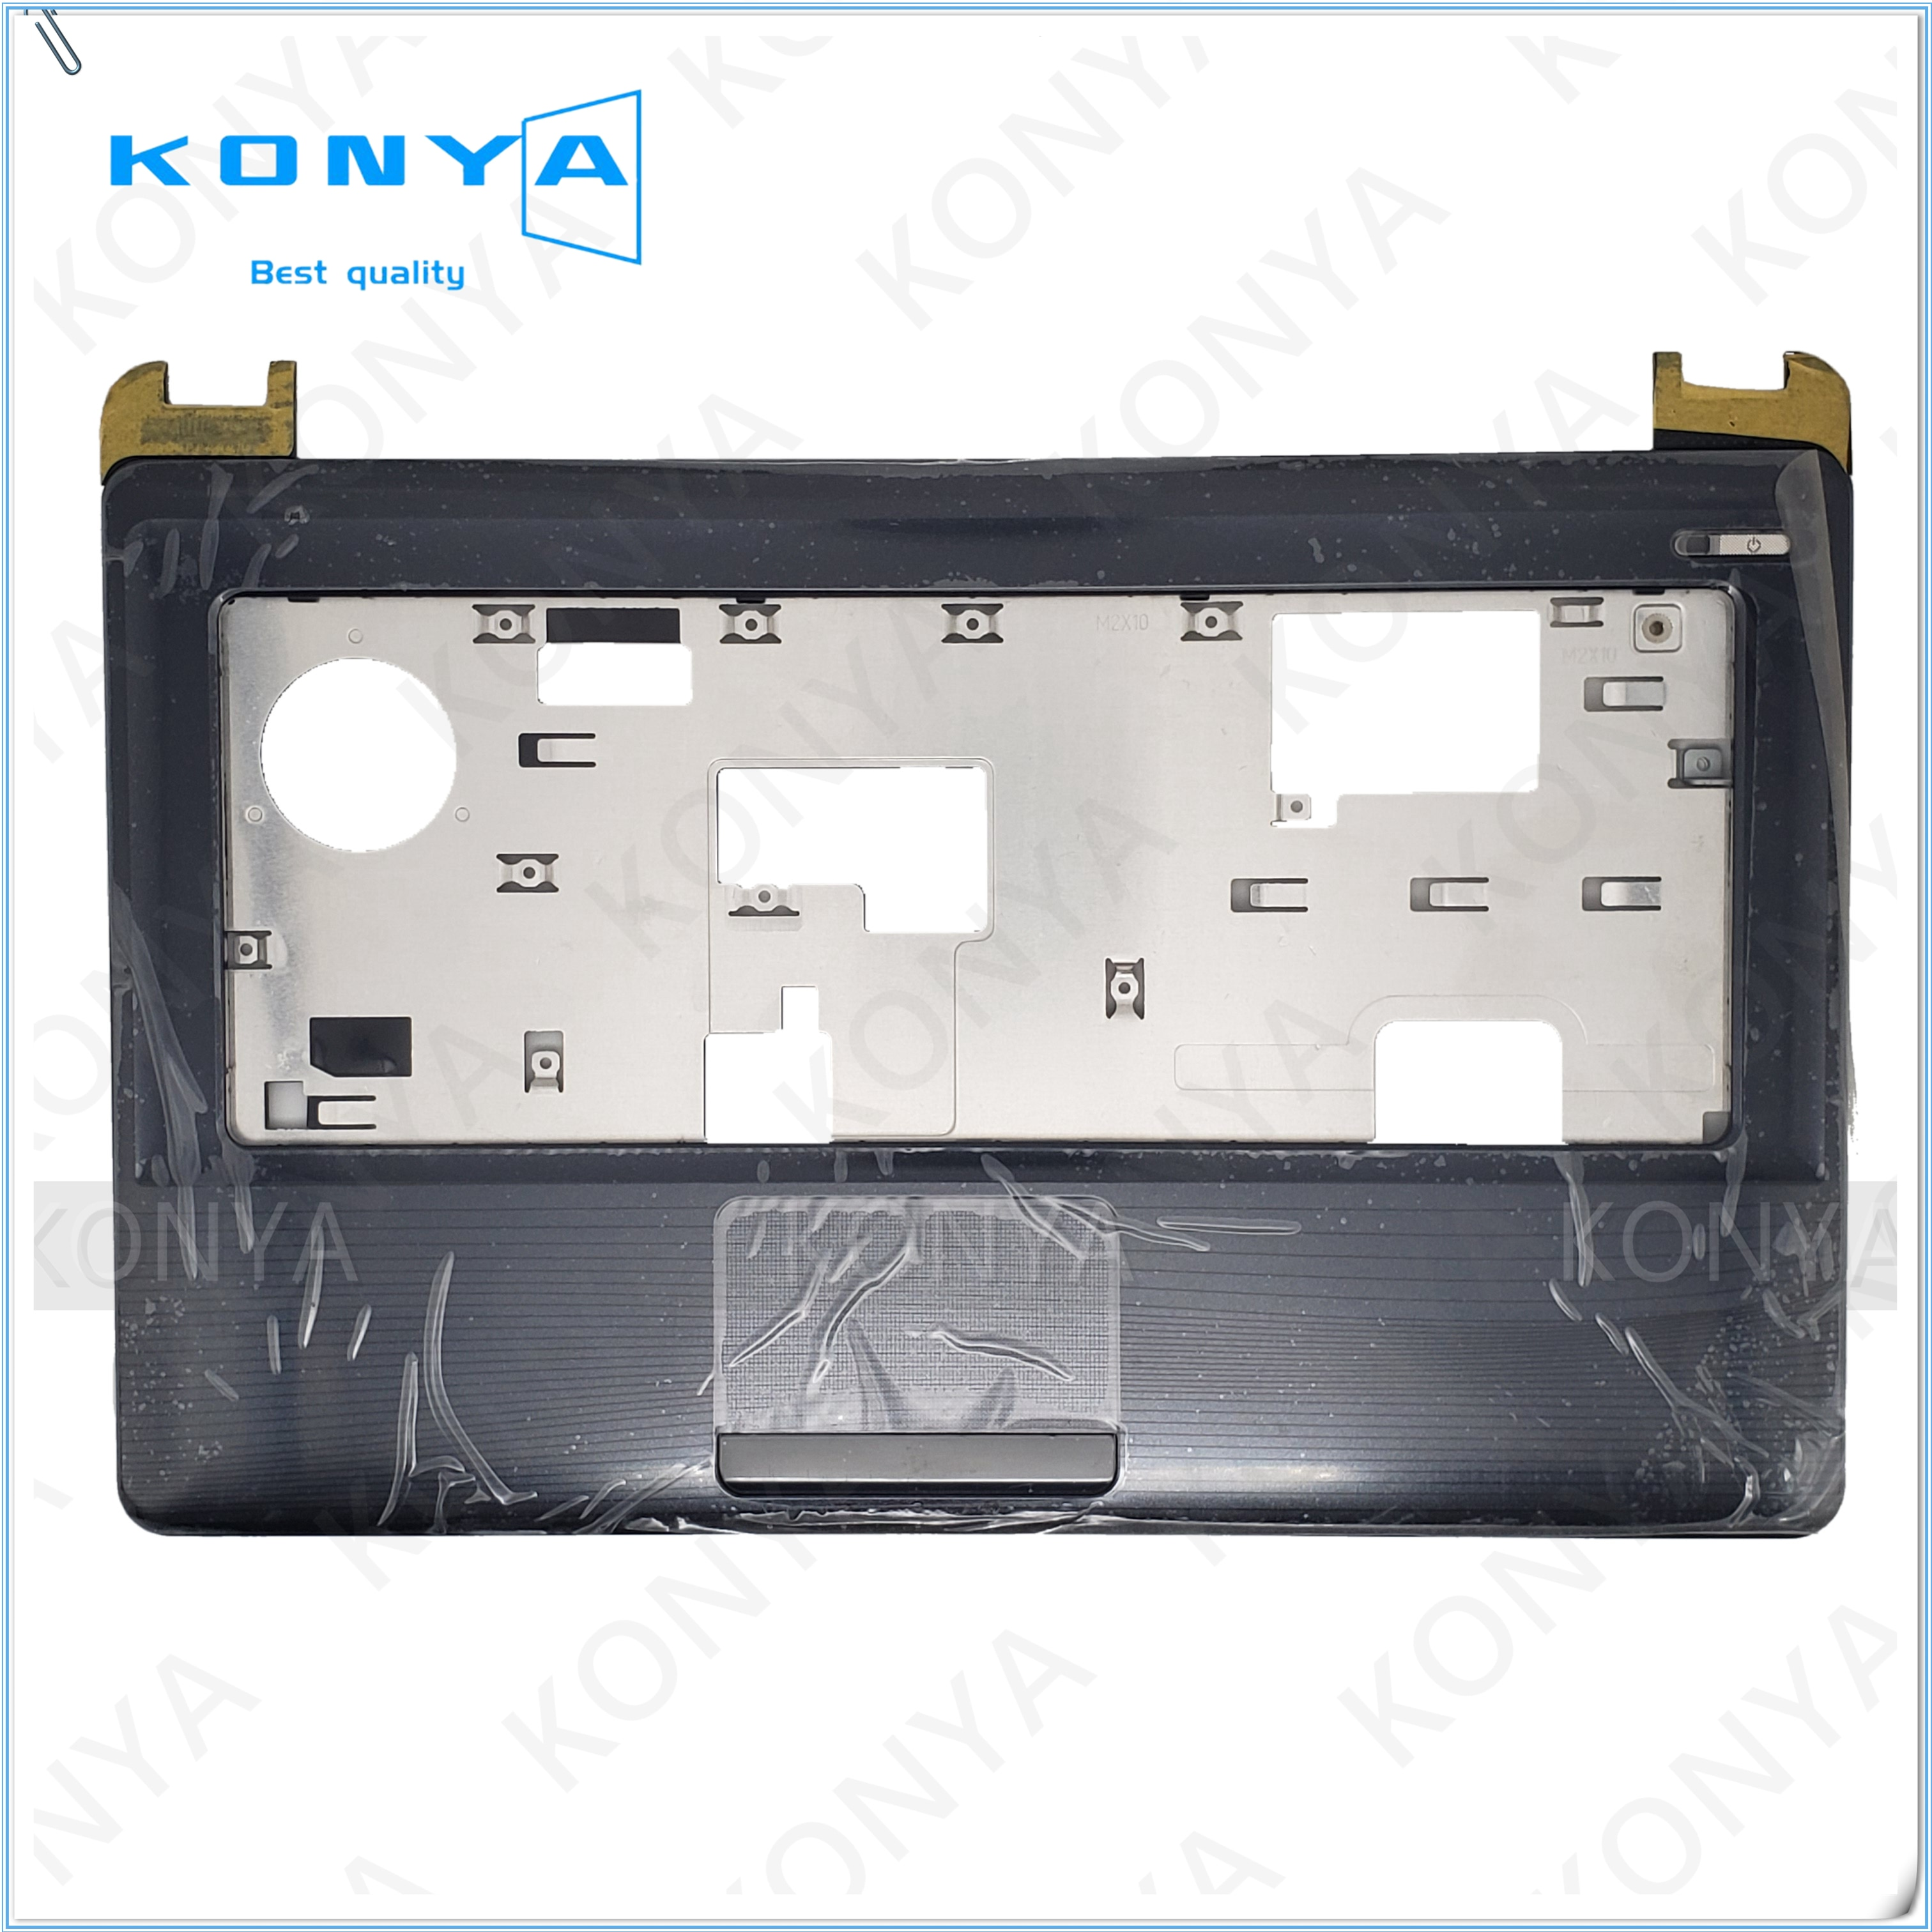 Novo original para asus k42 x42 a42 k42j x42j a42j portátil apoio de mãos superior caso touchpad 13gnxs3ap011-3 palmrest capa superior